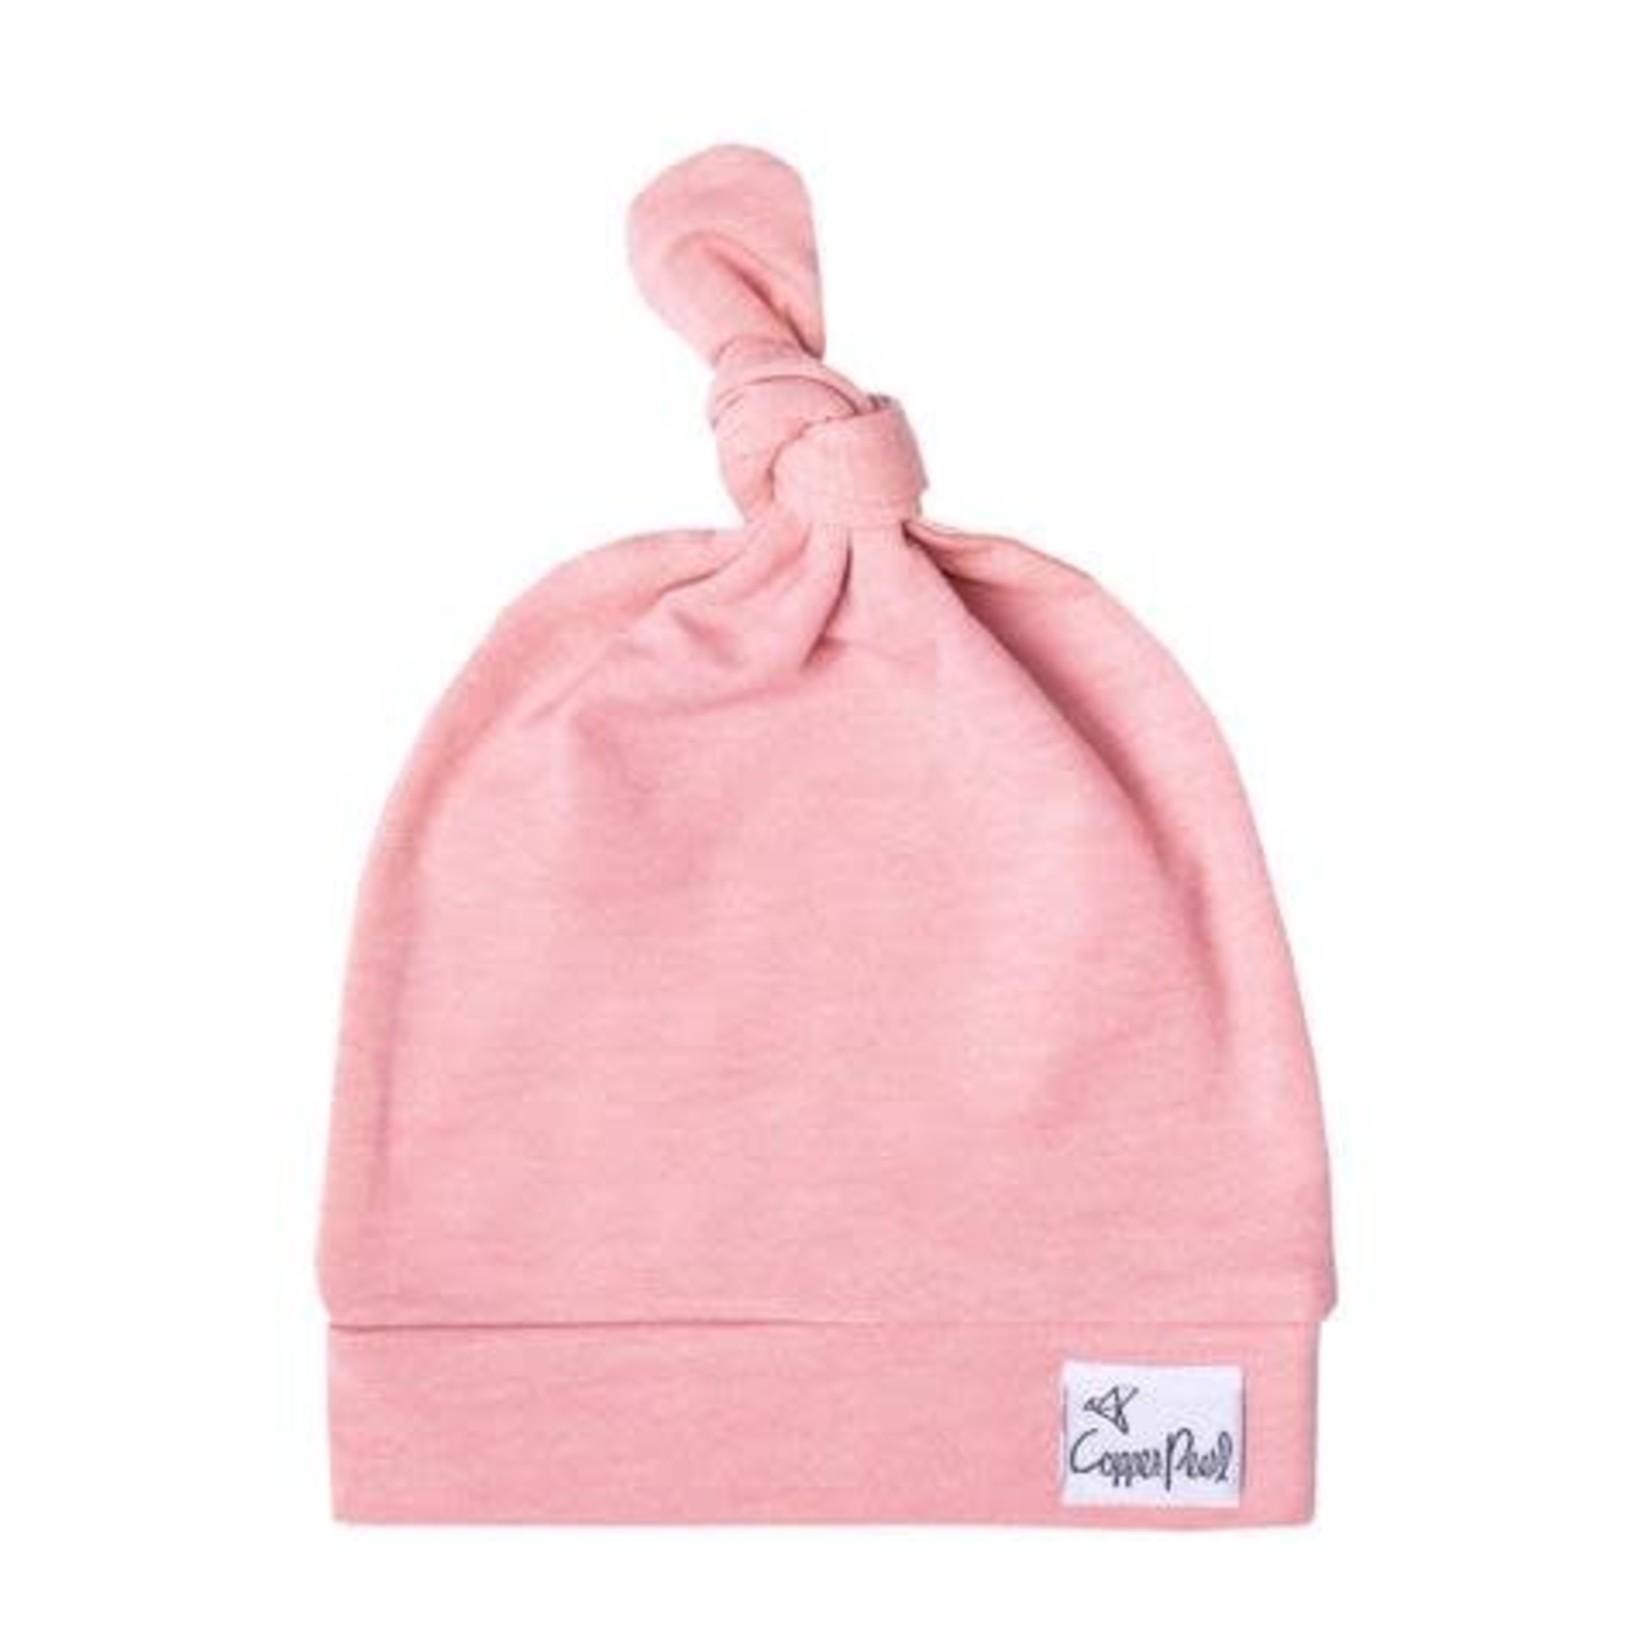 Copper Pearl Newborn Top Knot Hat, Darling